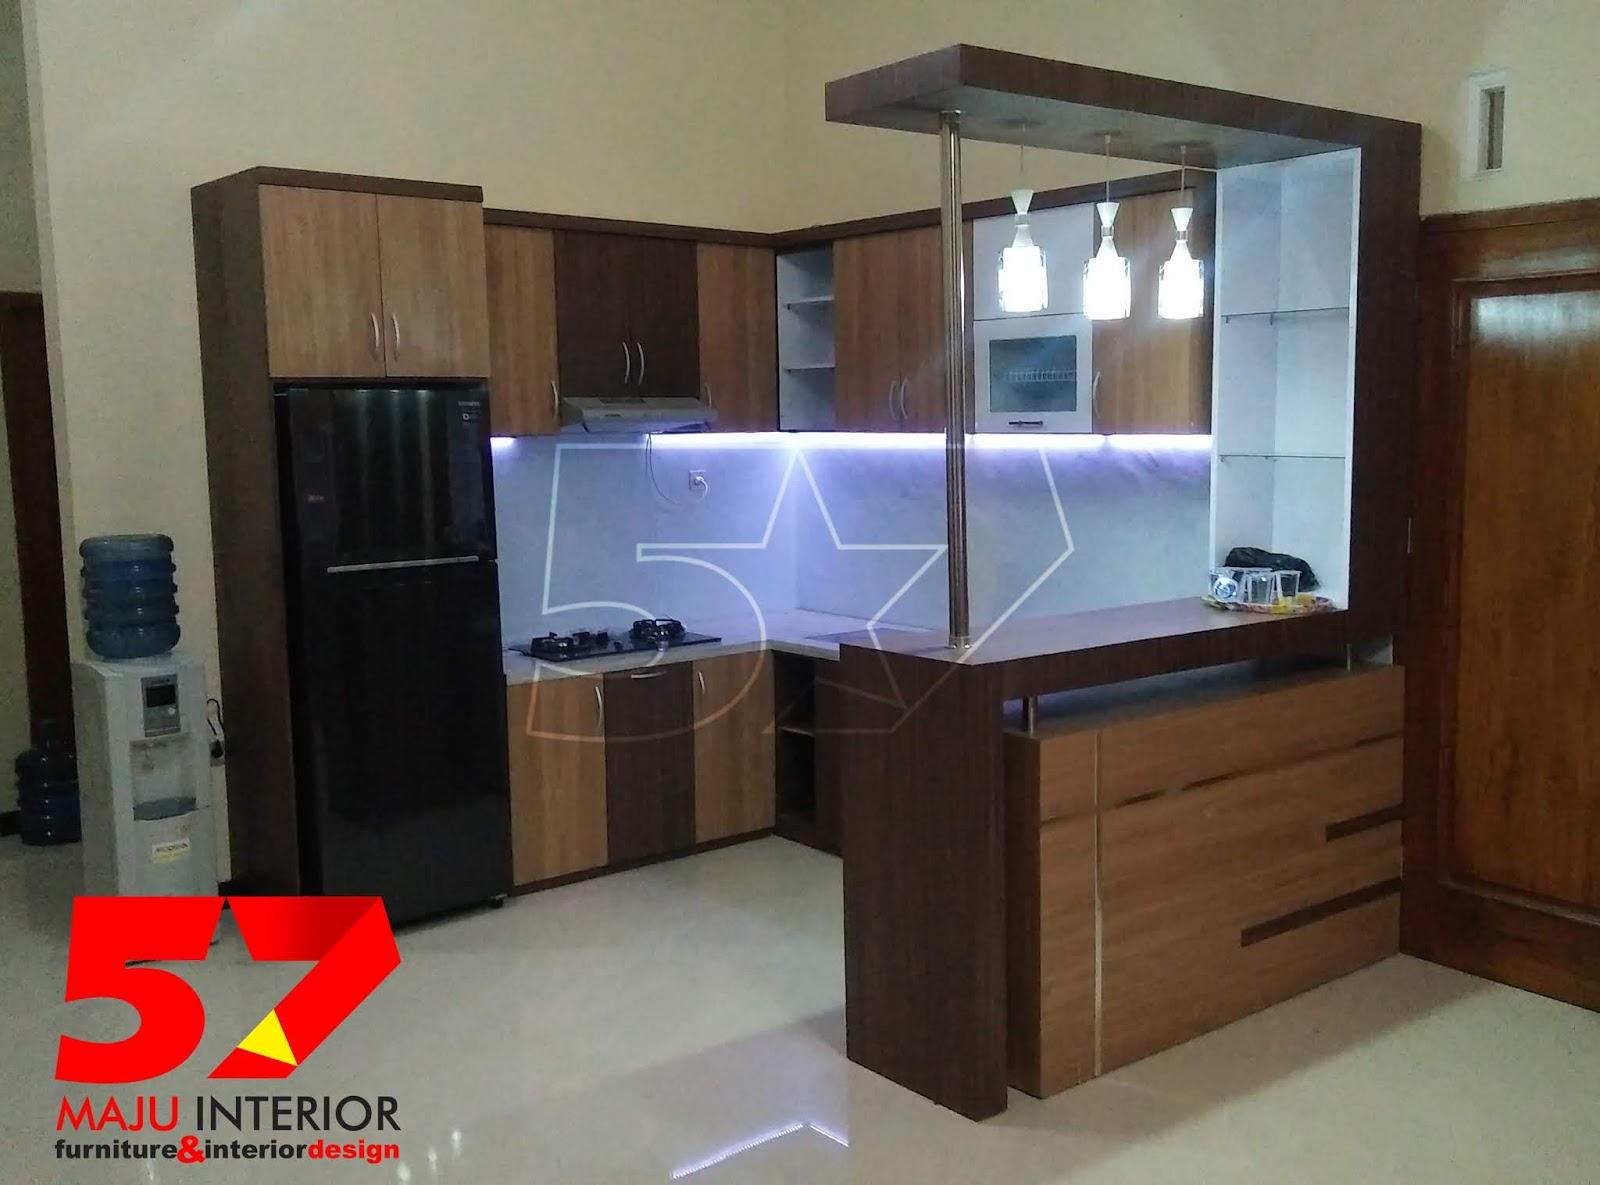 Toko kitchen set madiun kediri tulungagung harga kitchen set aluminium kitchen set minimalis kediri